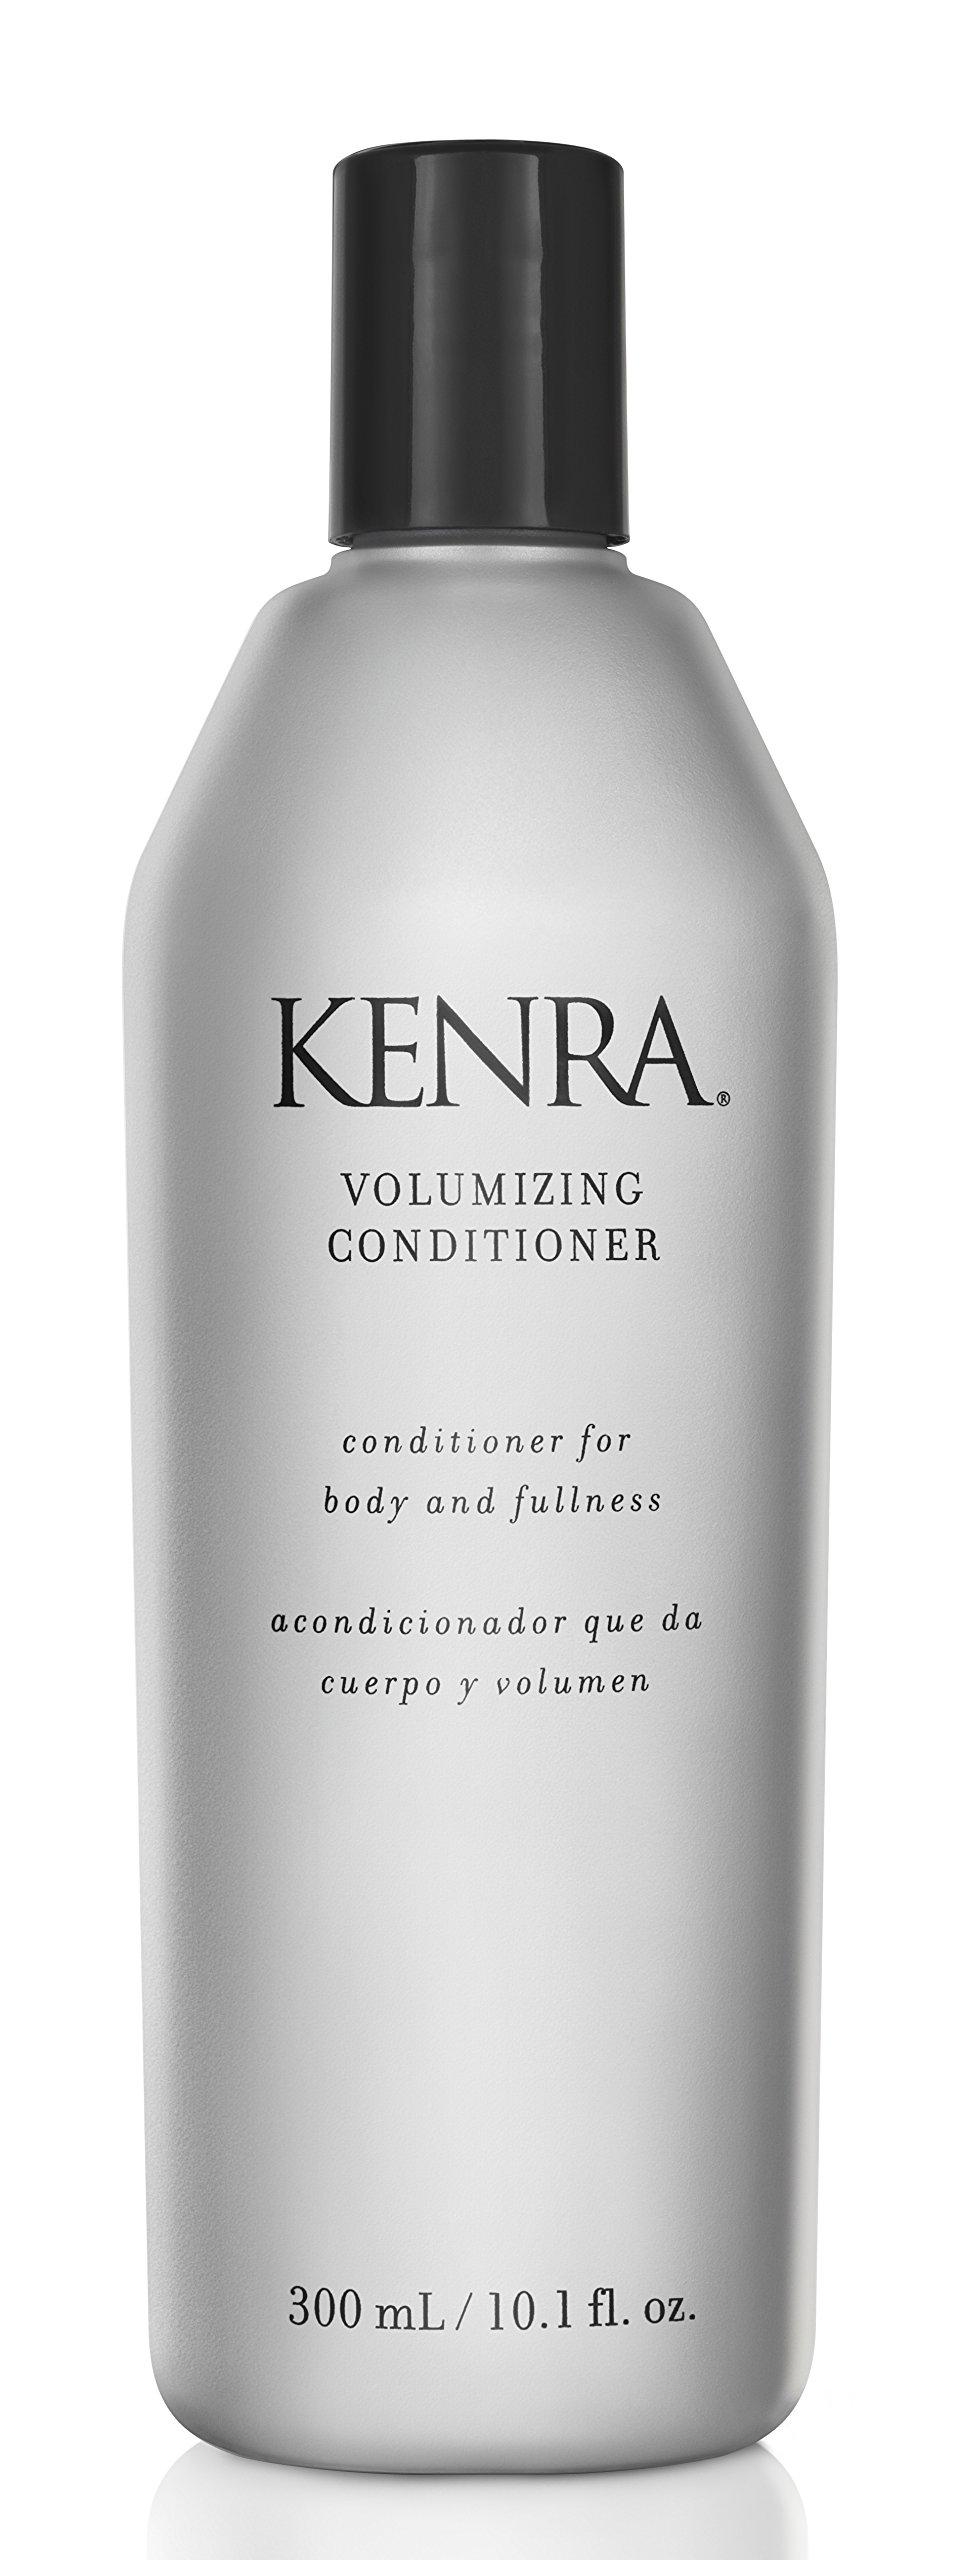 Kenra Volumizing Conditioner, 10.1 Ounce